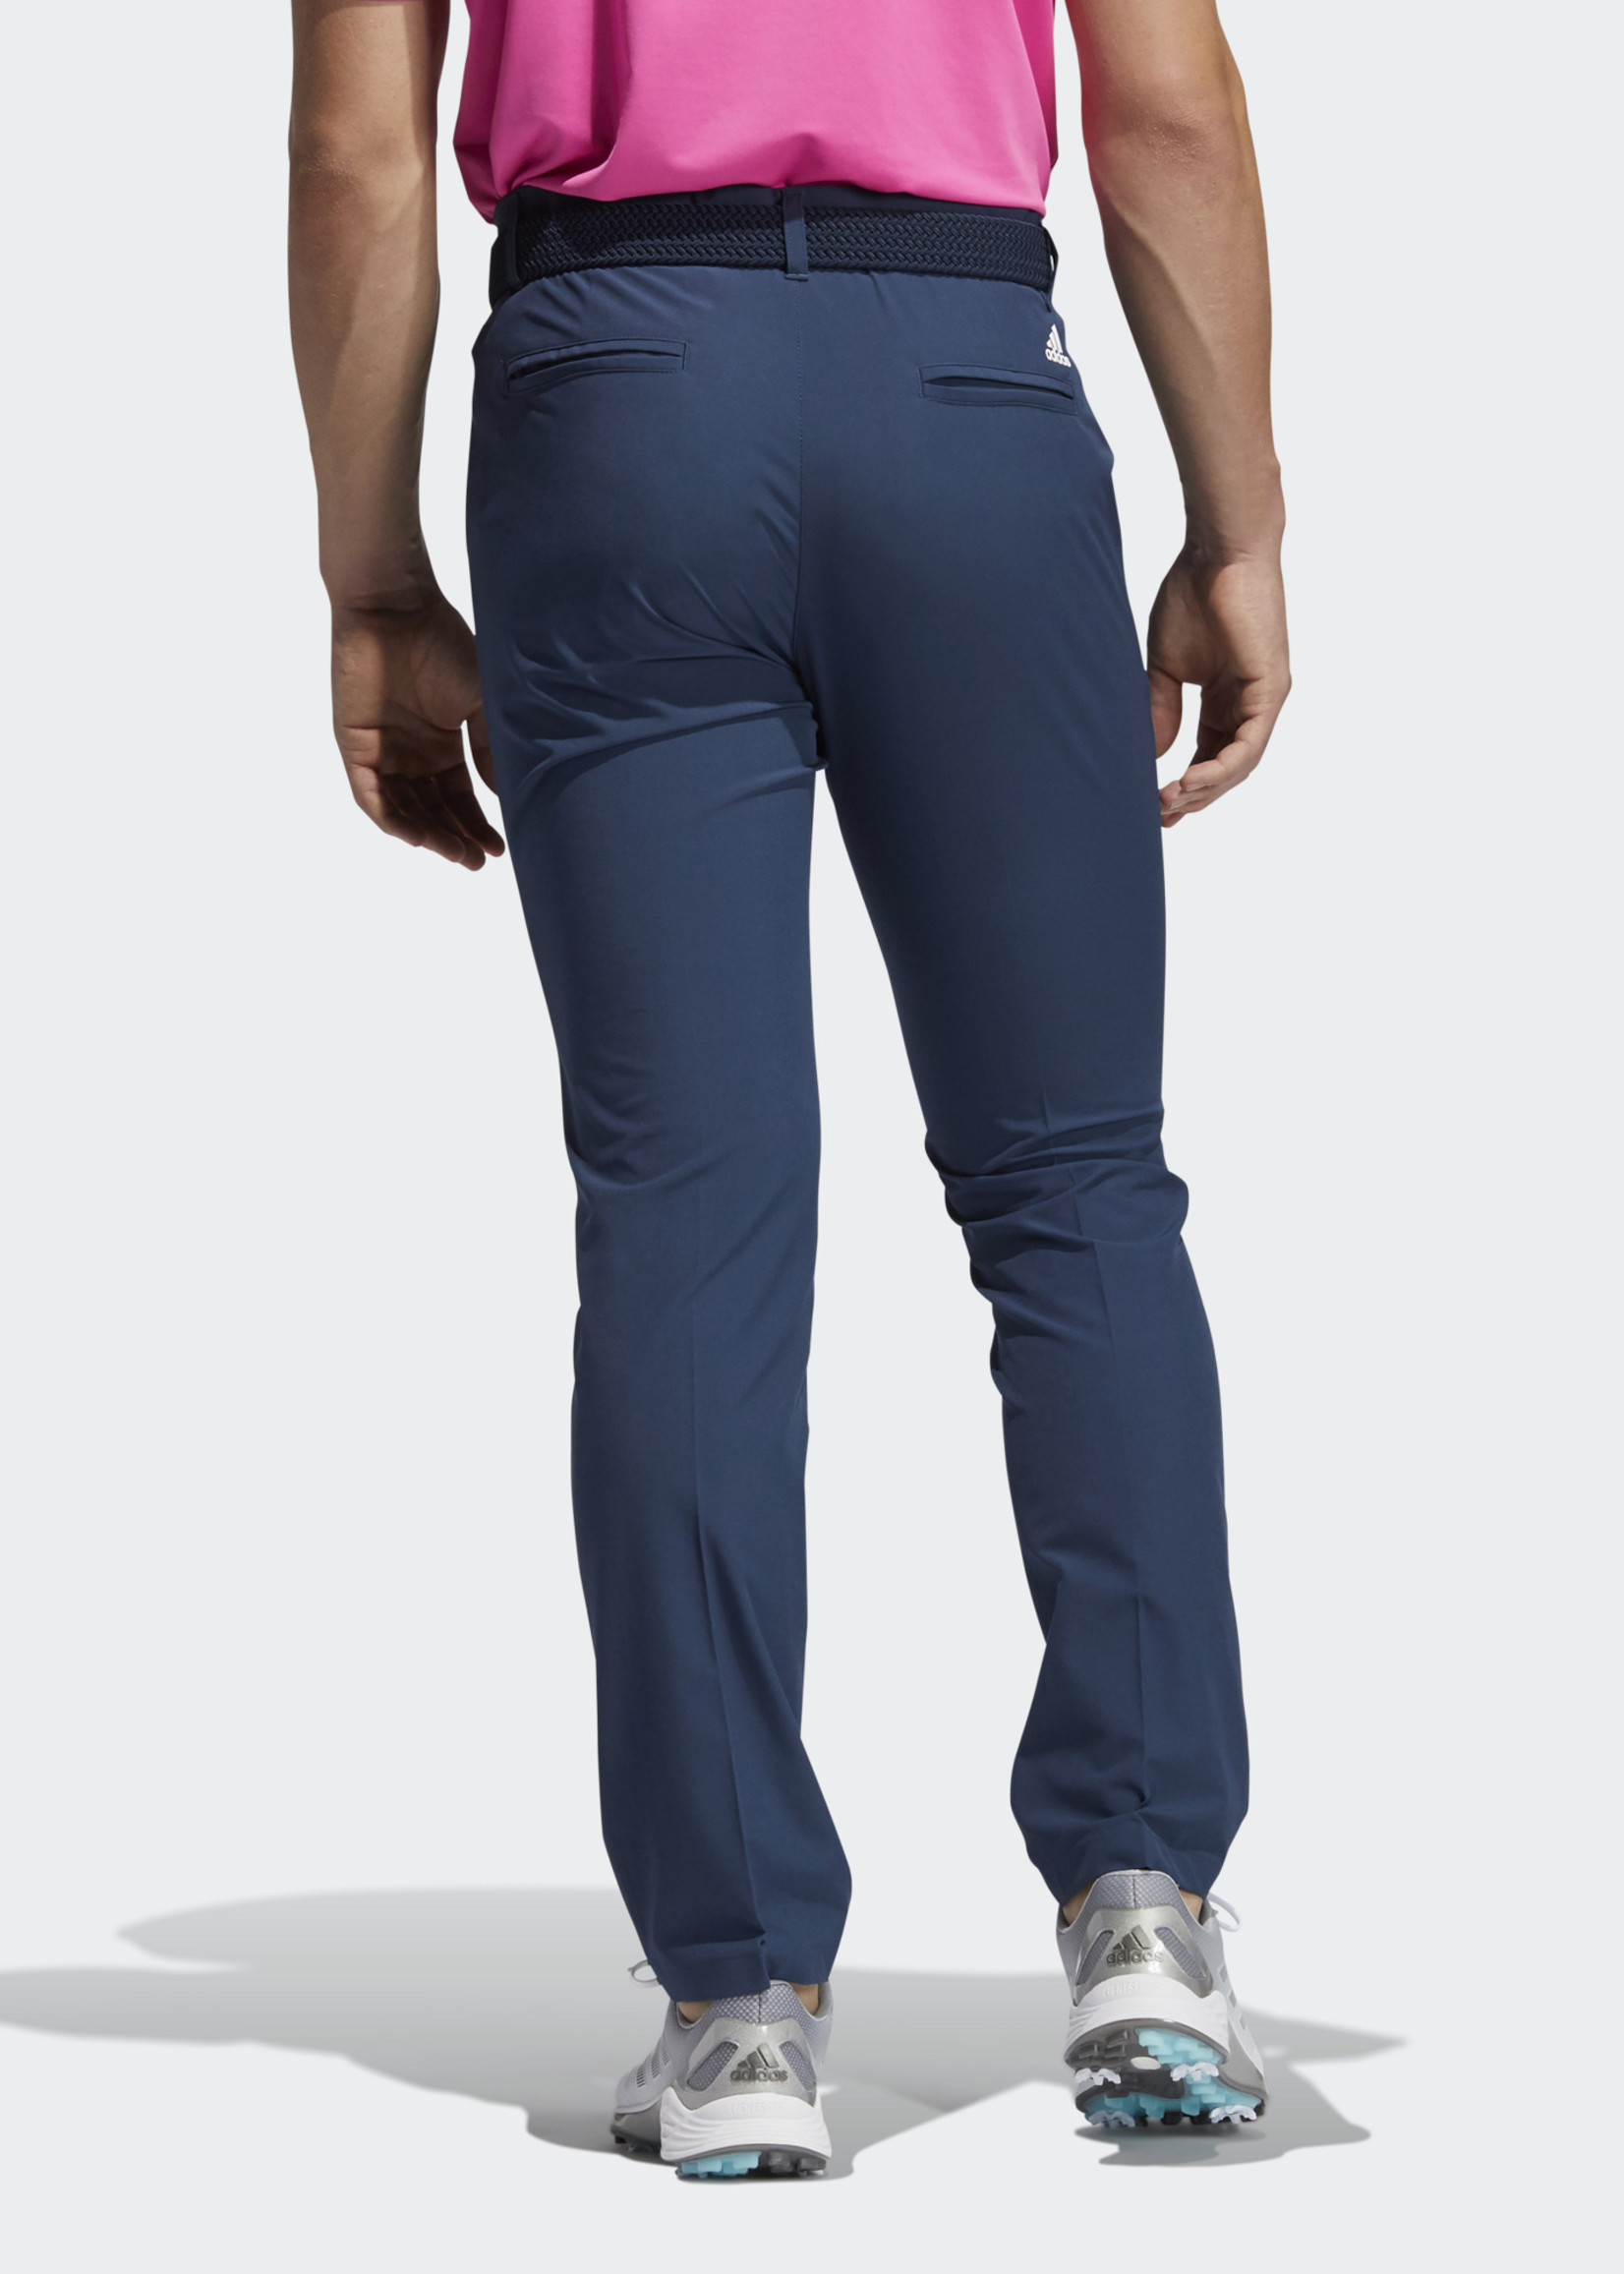 Adidas ULT PANT TPRD       CRENAV